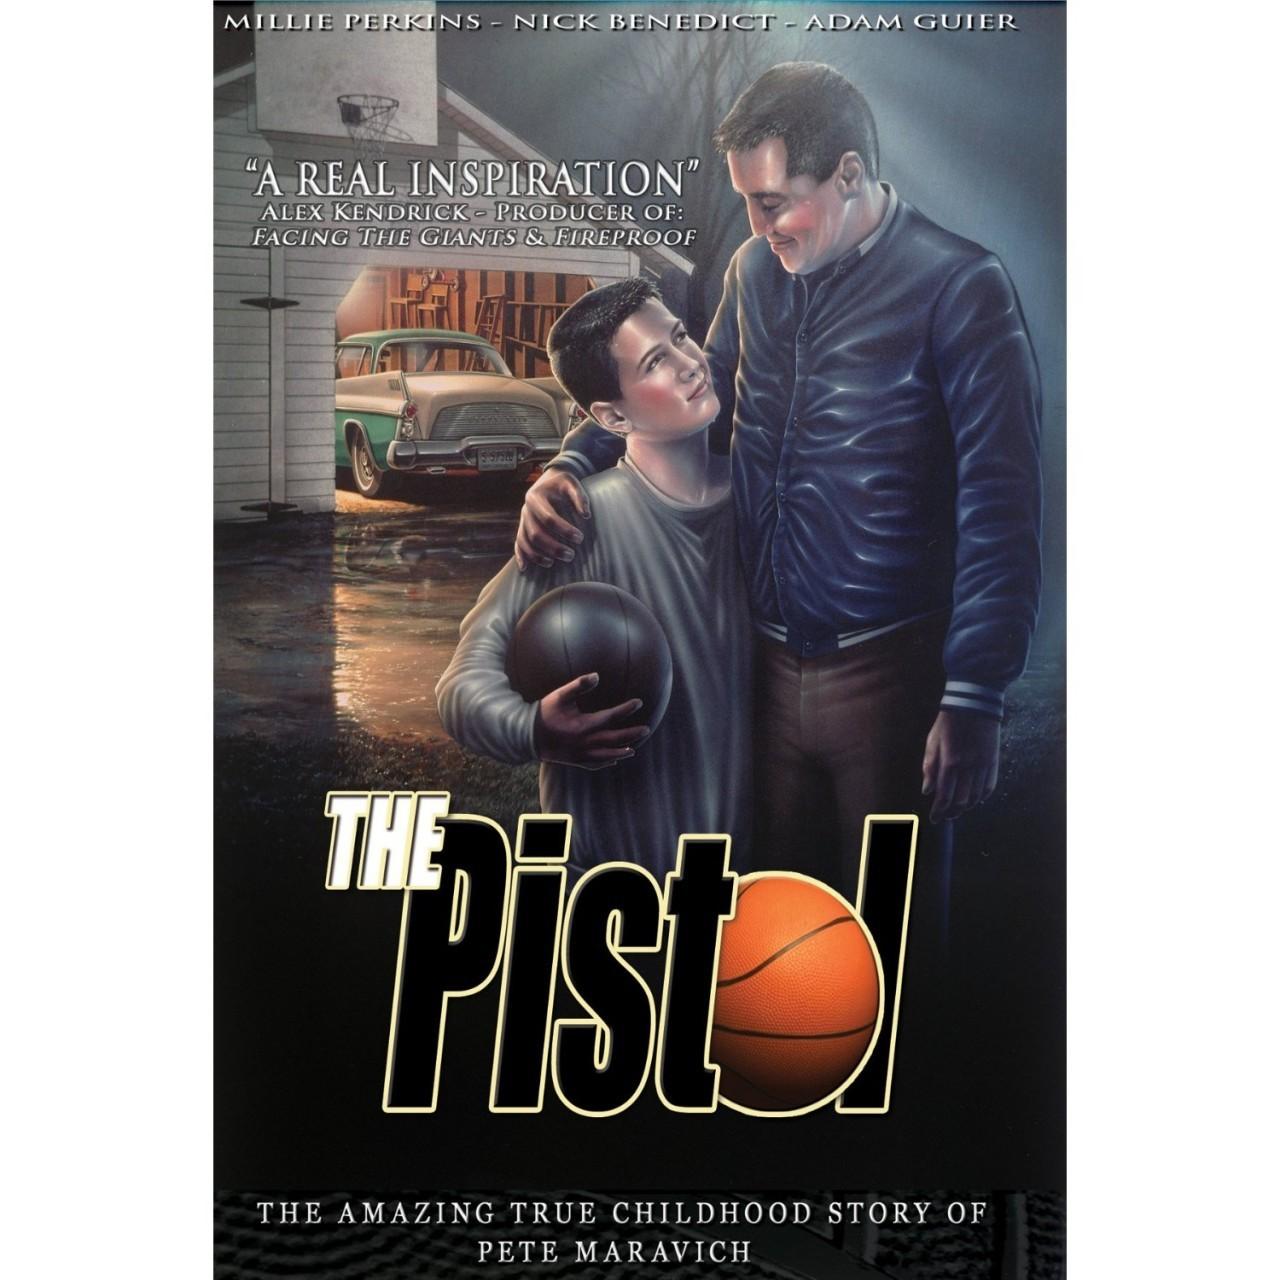 The pistol   dvd